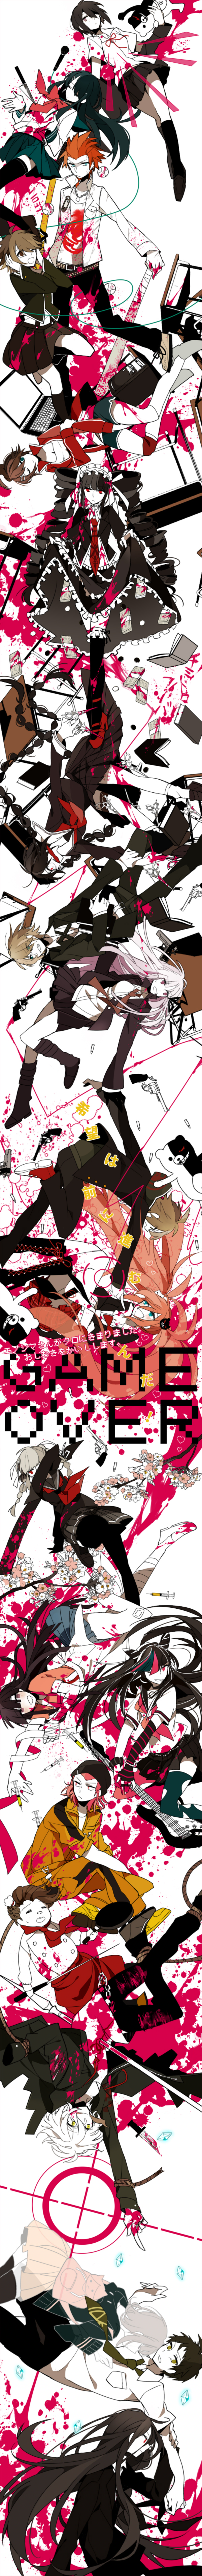 Tags: Anime, Akina422, Super Danganronpa 2, Danganronpa, Ikusaba Mukuro, Hanamura Teruteru, Maizono Sayaka, Tsumiki Mikan, Togami Byakuya, Kuwata Leon, Hinata Hajime, Celestia Ludenberg, Souda Kazuichi